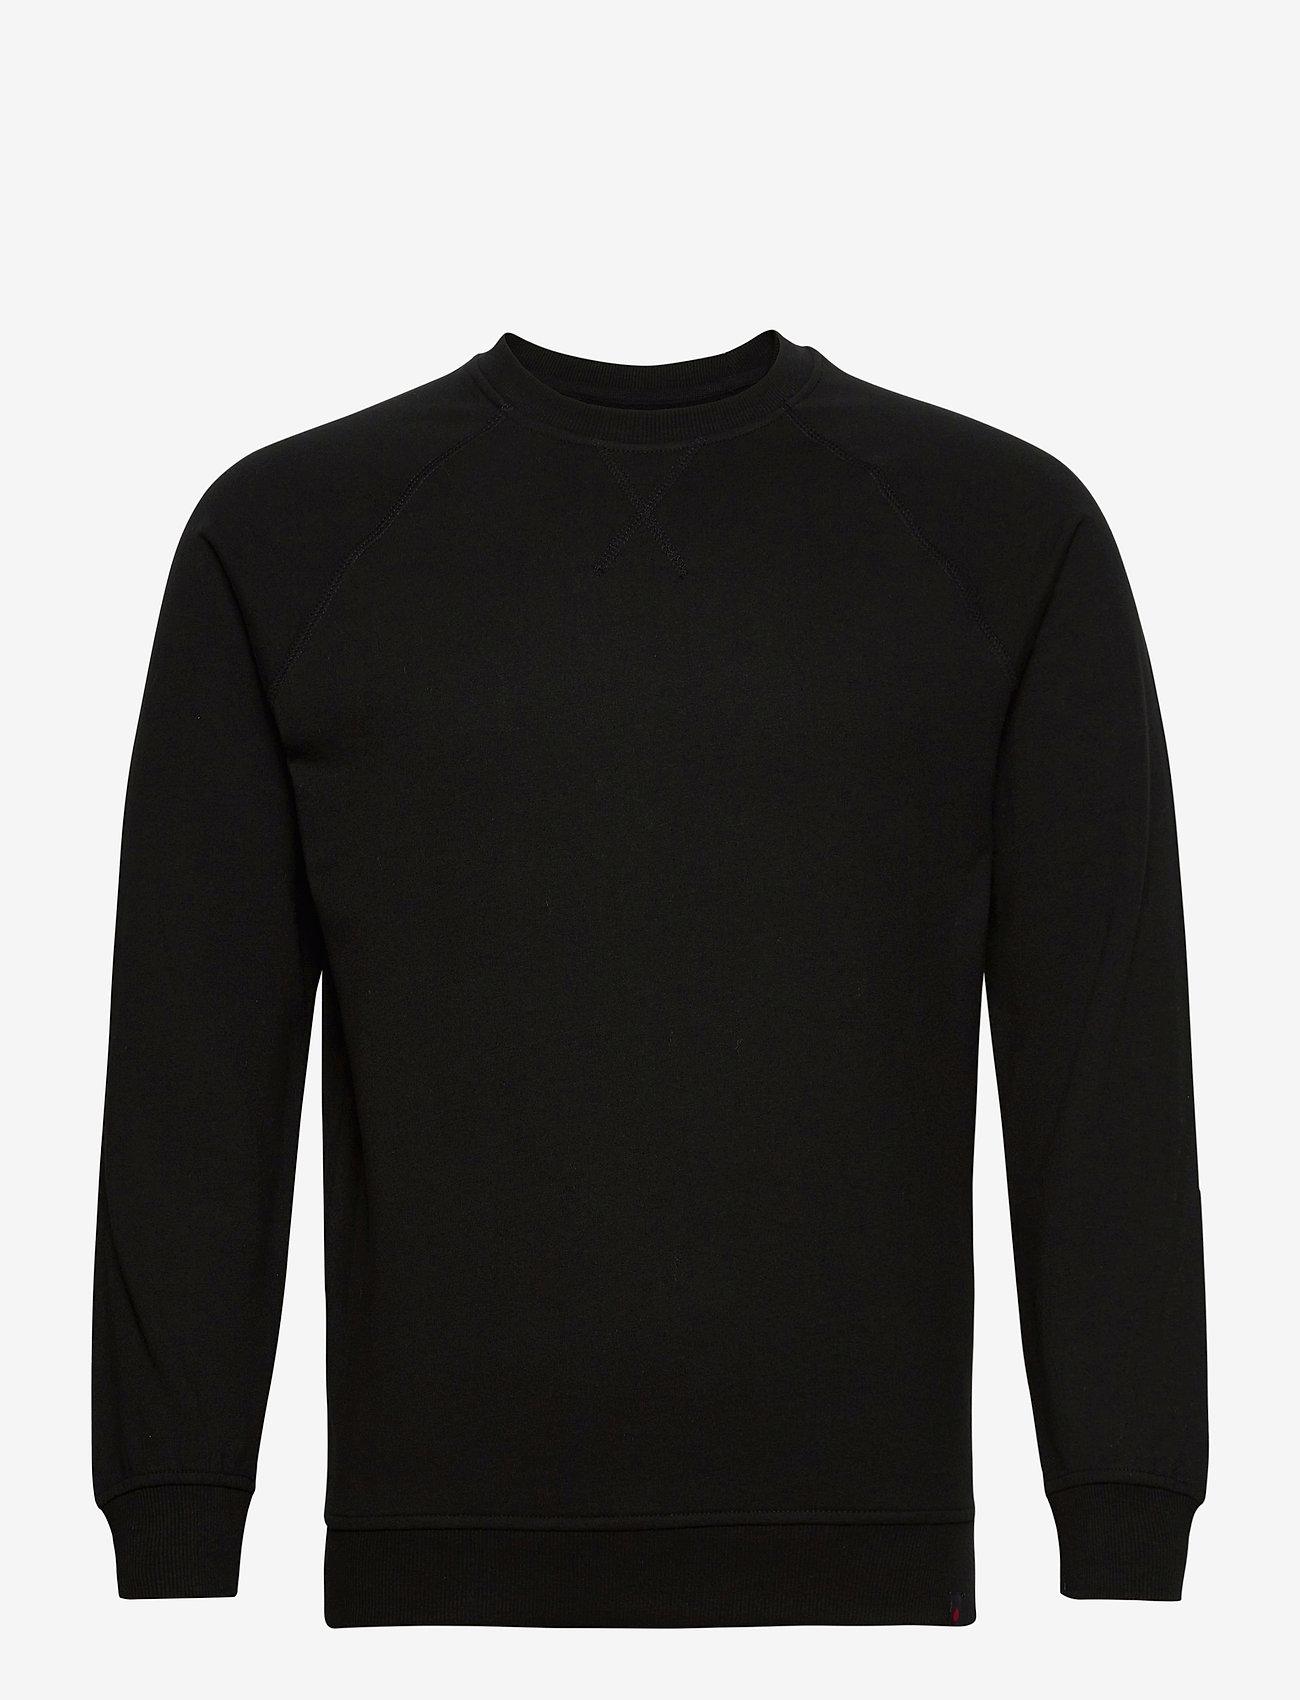 Denim project - BASIC SWEAT CREW - basic sweatshirts - 001 black - 0